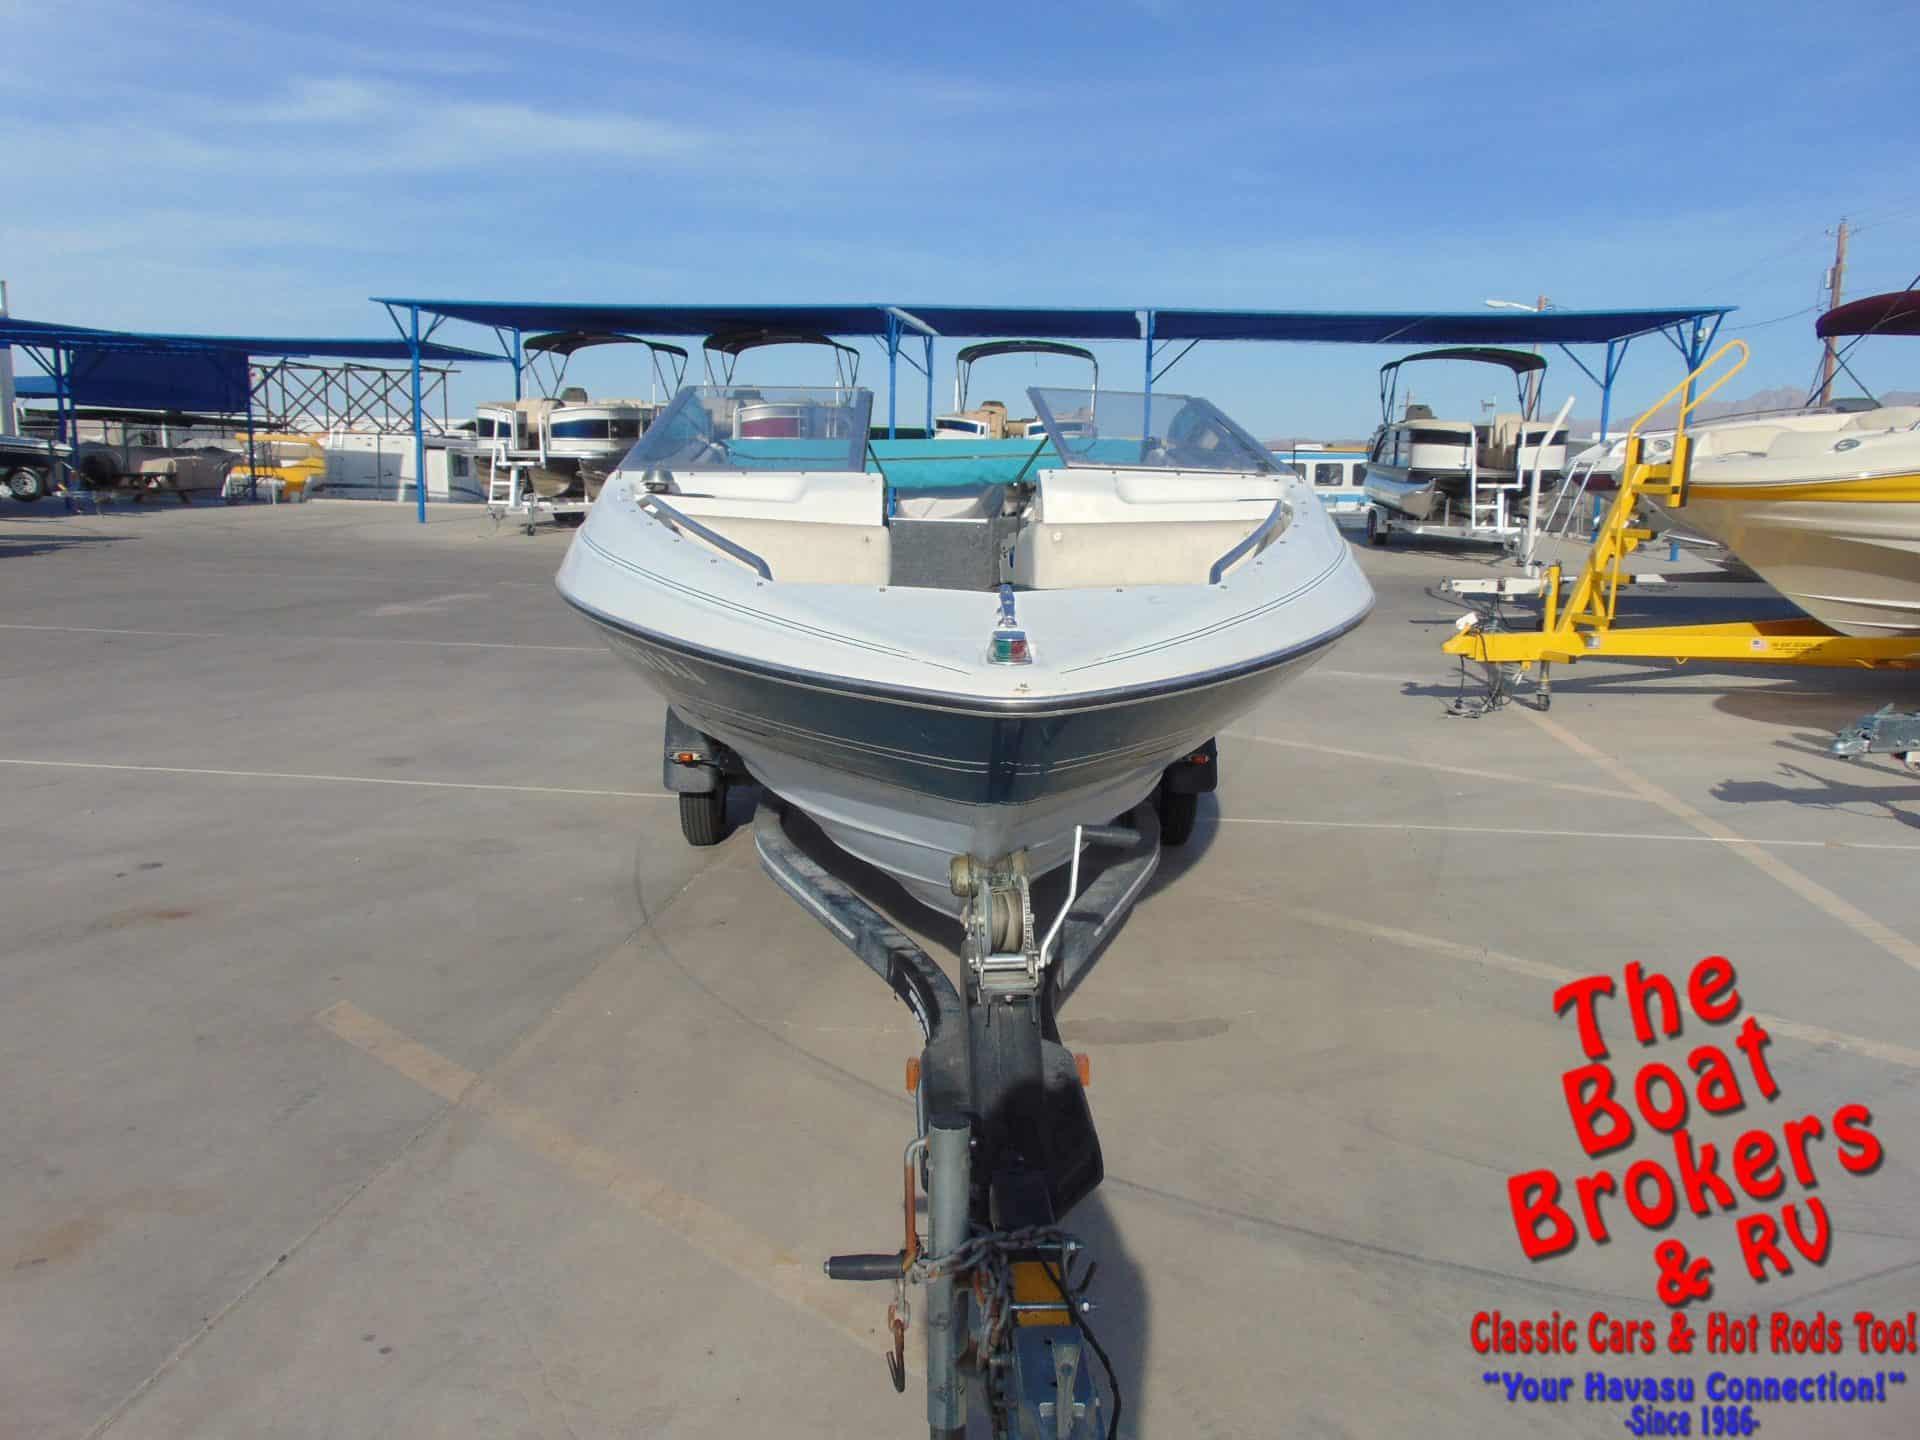 1991 18′ BAYLINER CAPRI OPEN BOW - New & Used Boats & RV